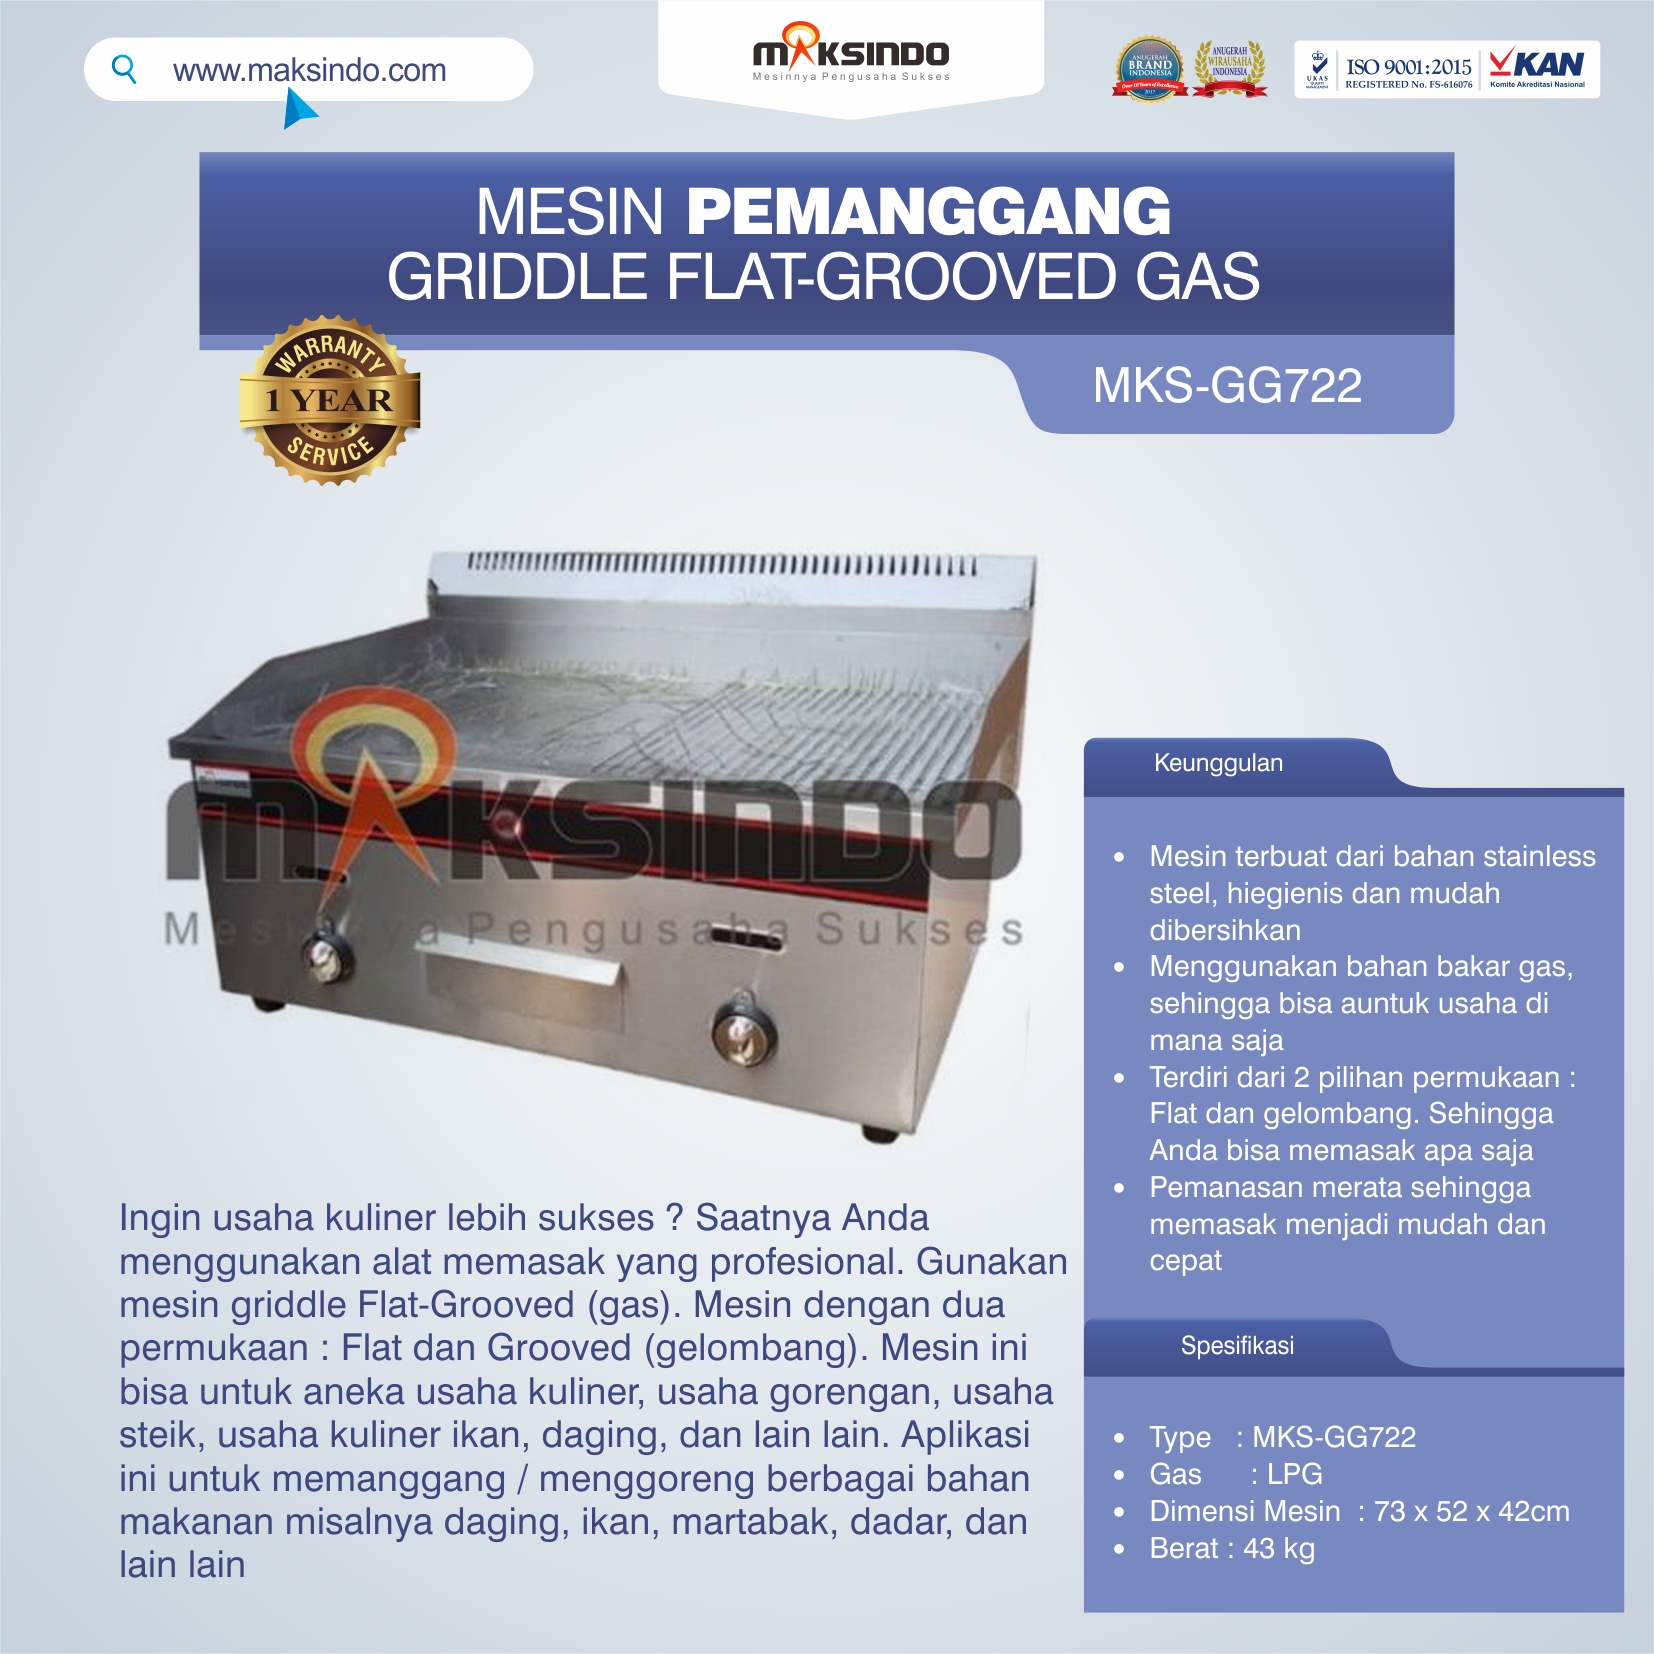 Jual Pemanggang Griddle Flat-Grooved Gas (GG722) di Semarang